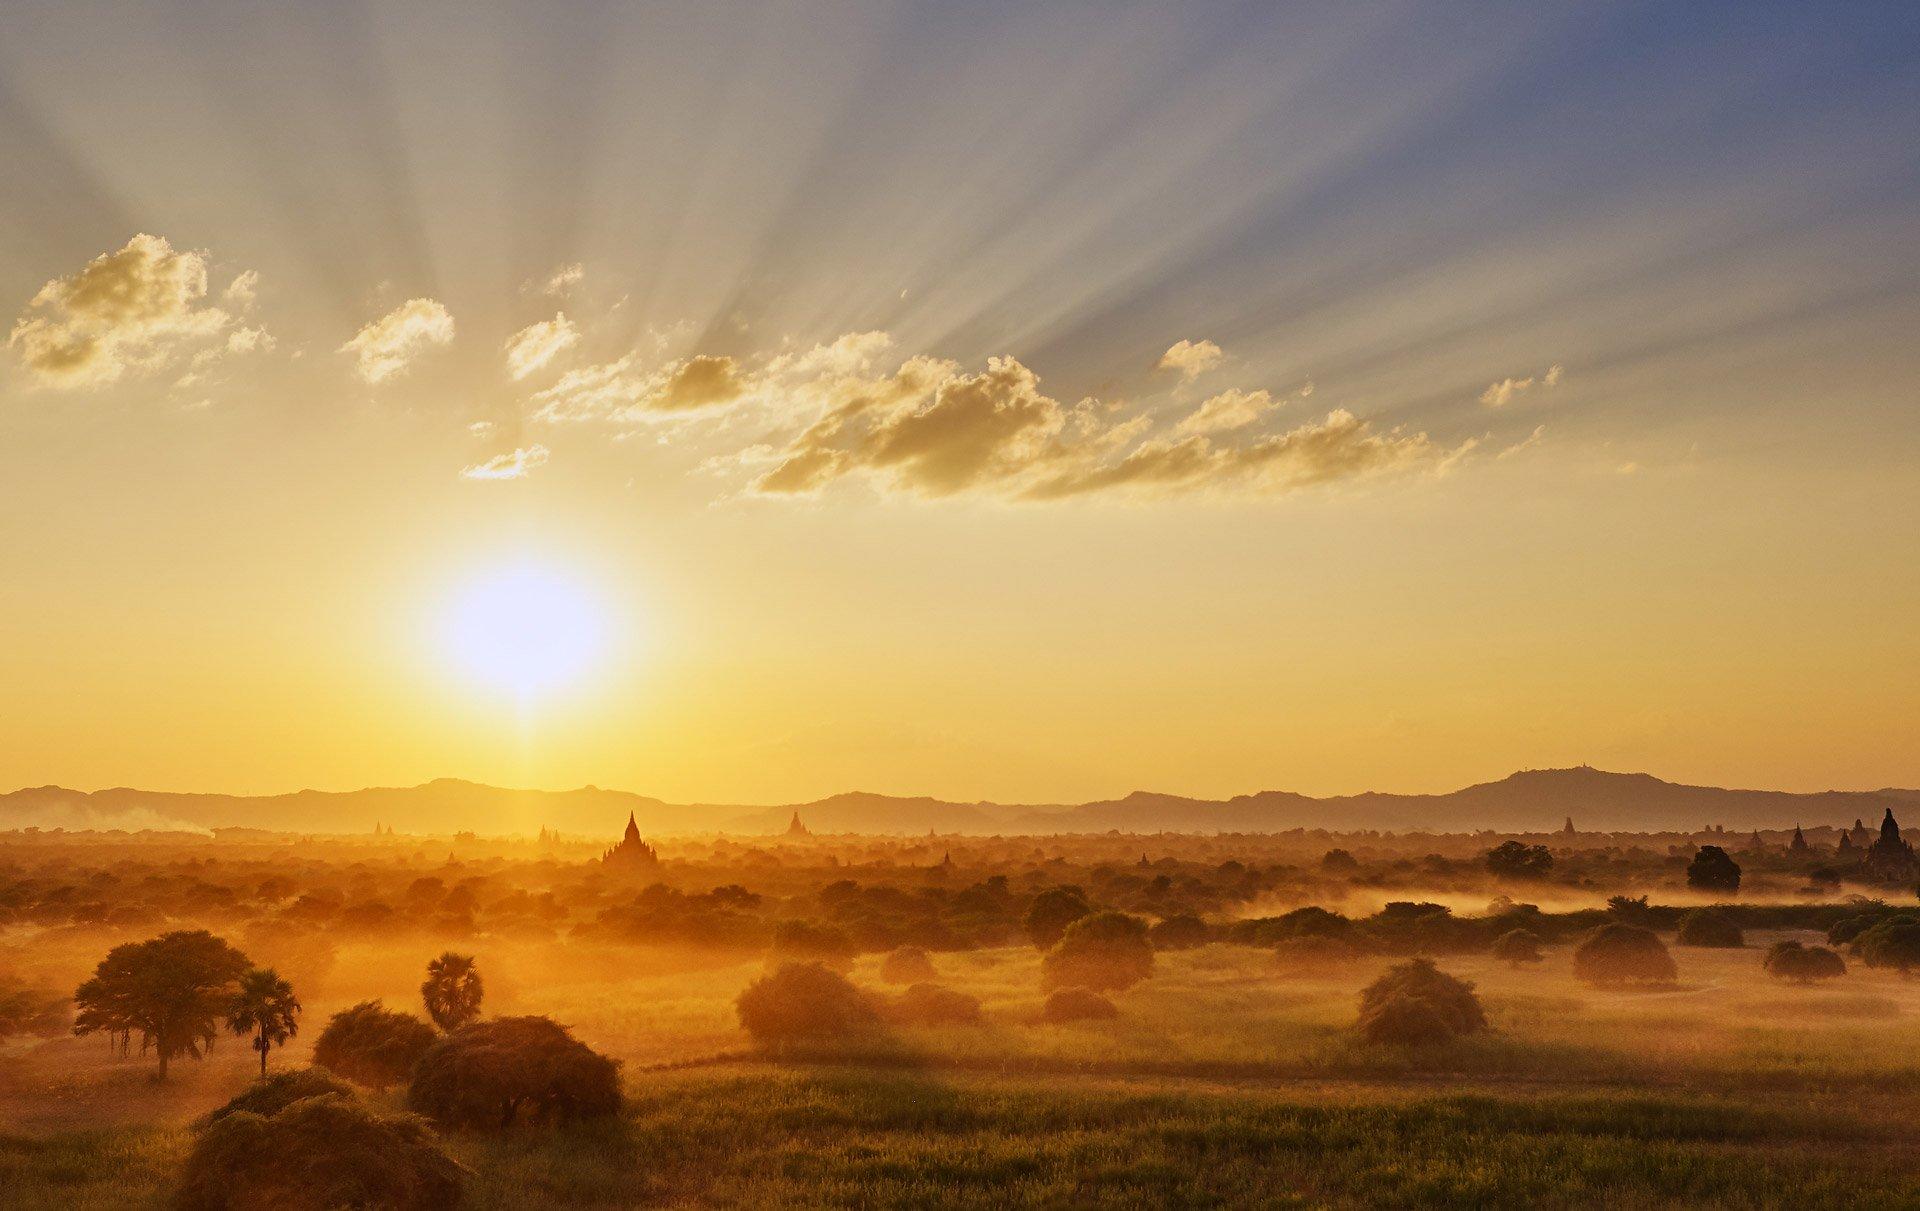 myanmar-travel-guide-3